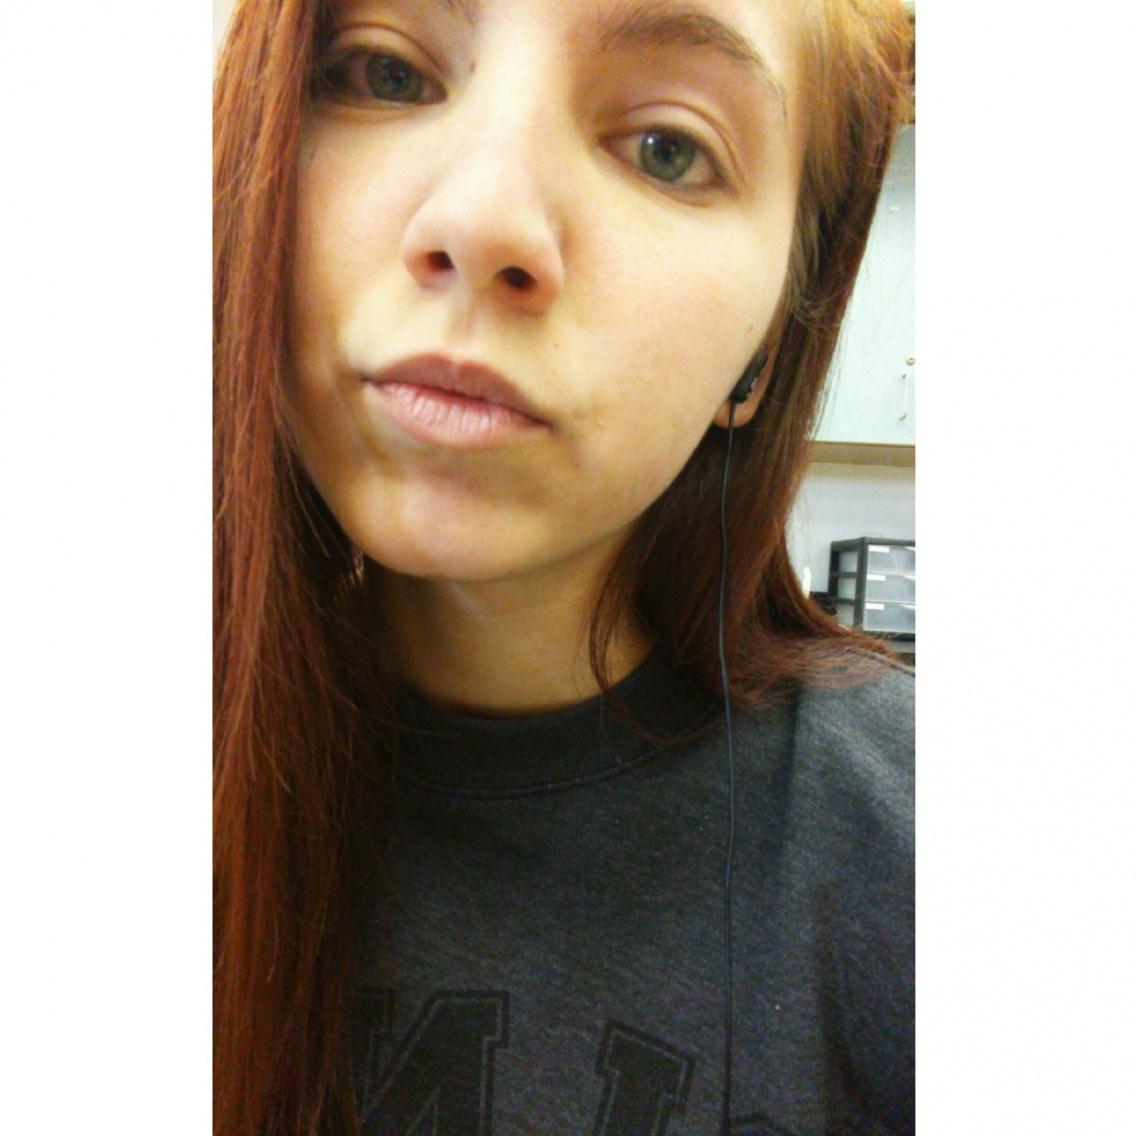 Hot teens selfie